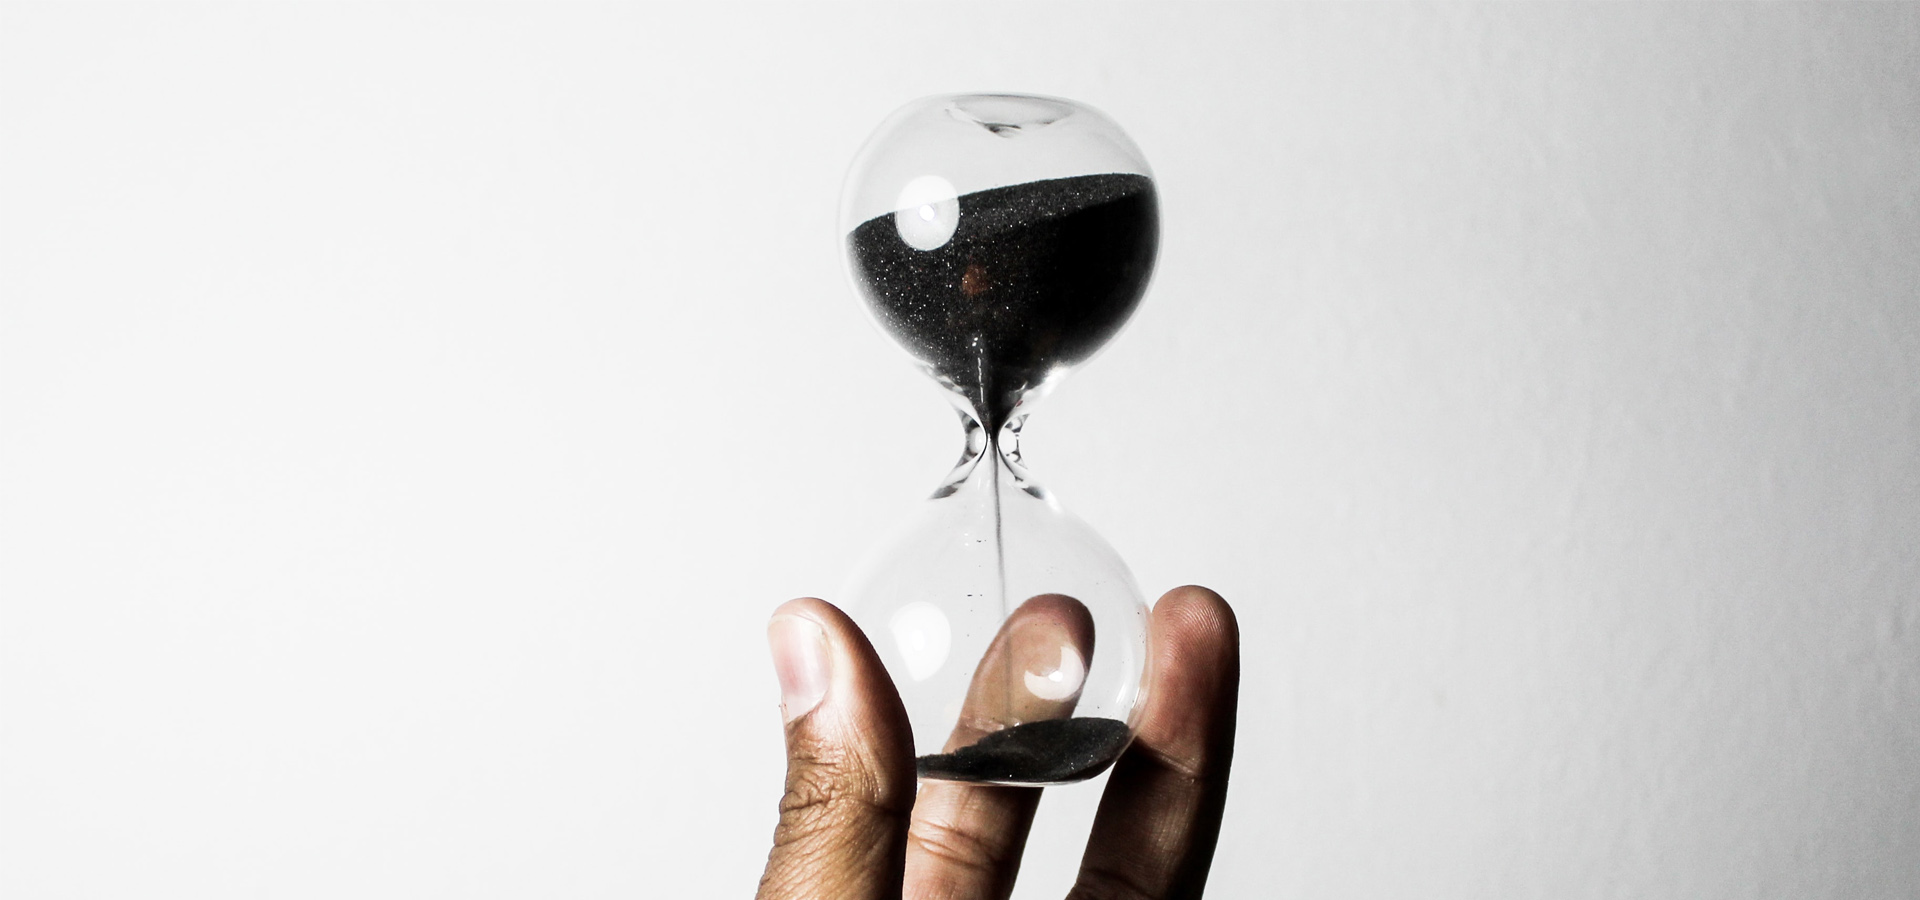 Hand holding an hourglass